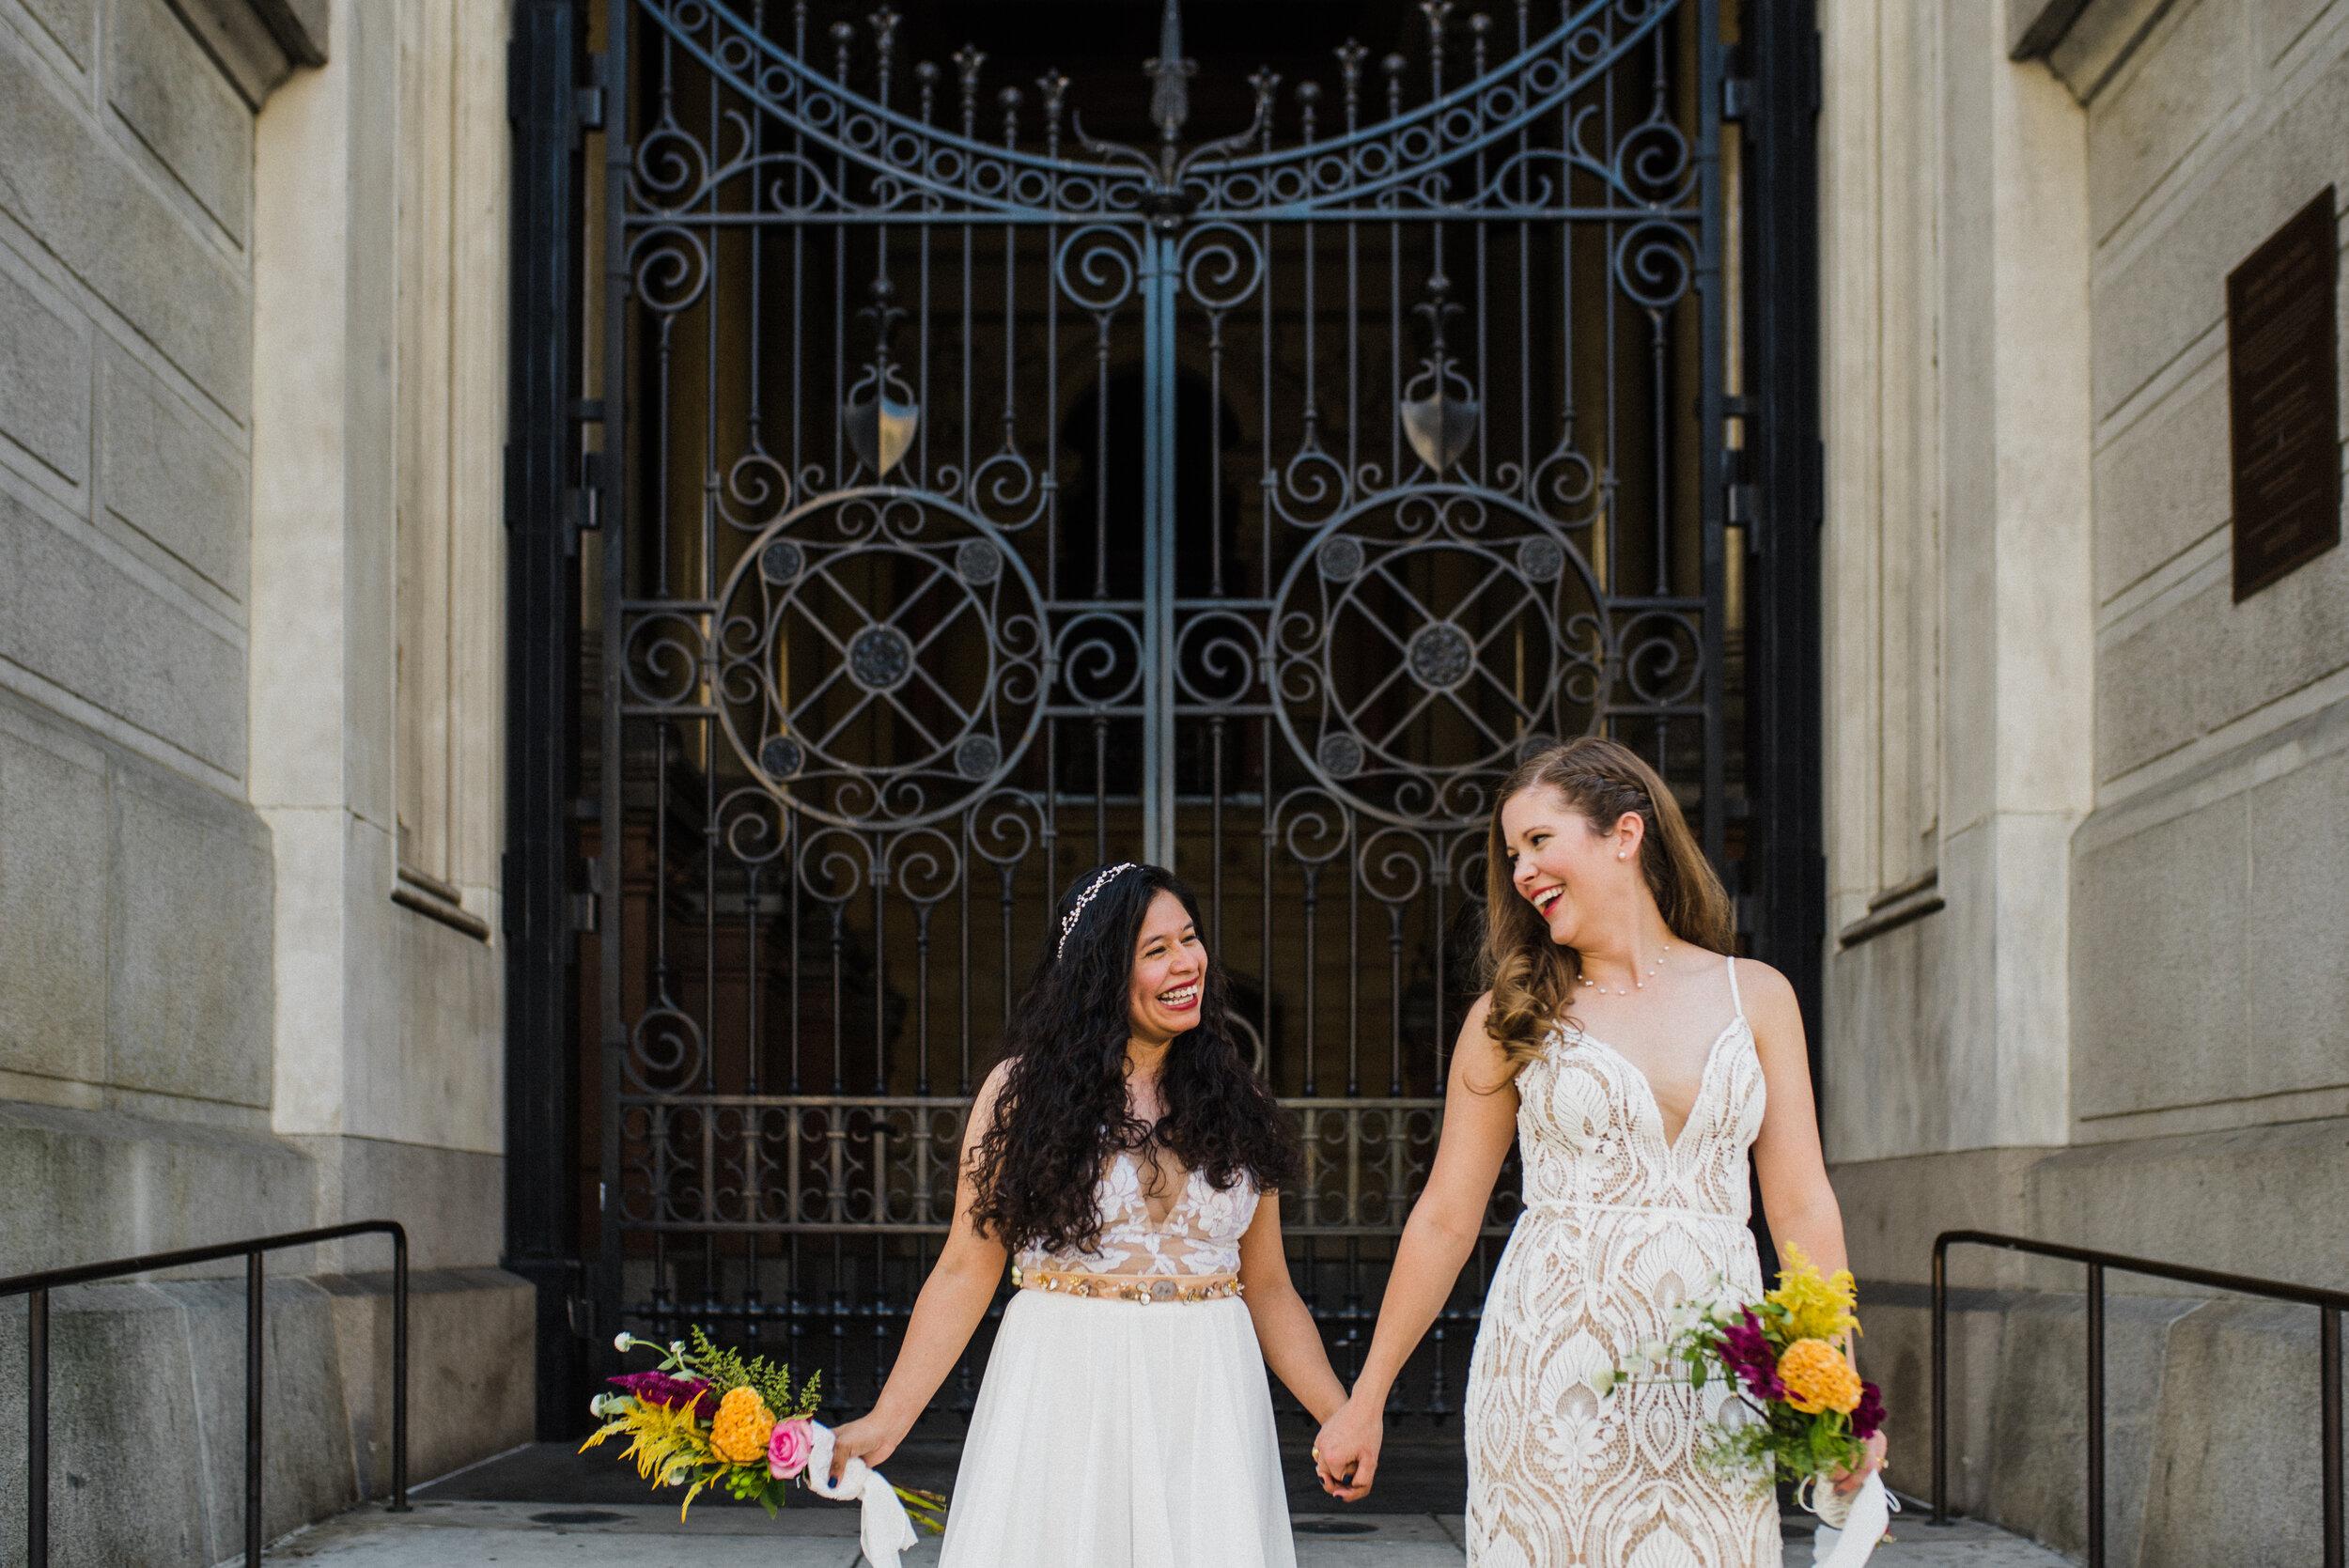 LGBTQ wedding couple walking around City Hall in Philadelphia